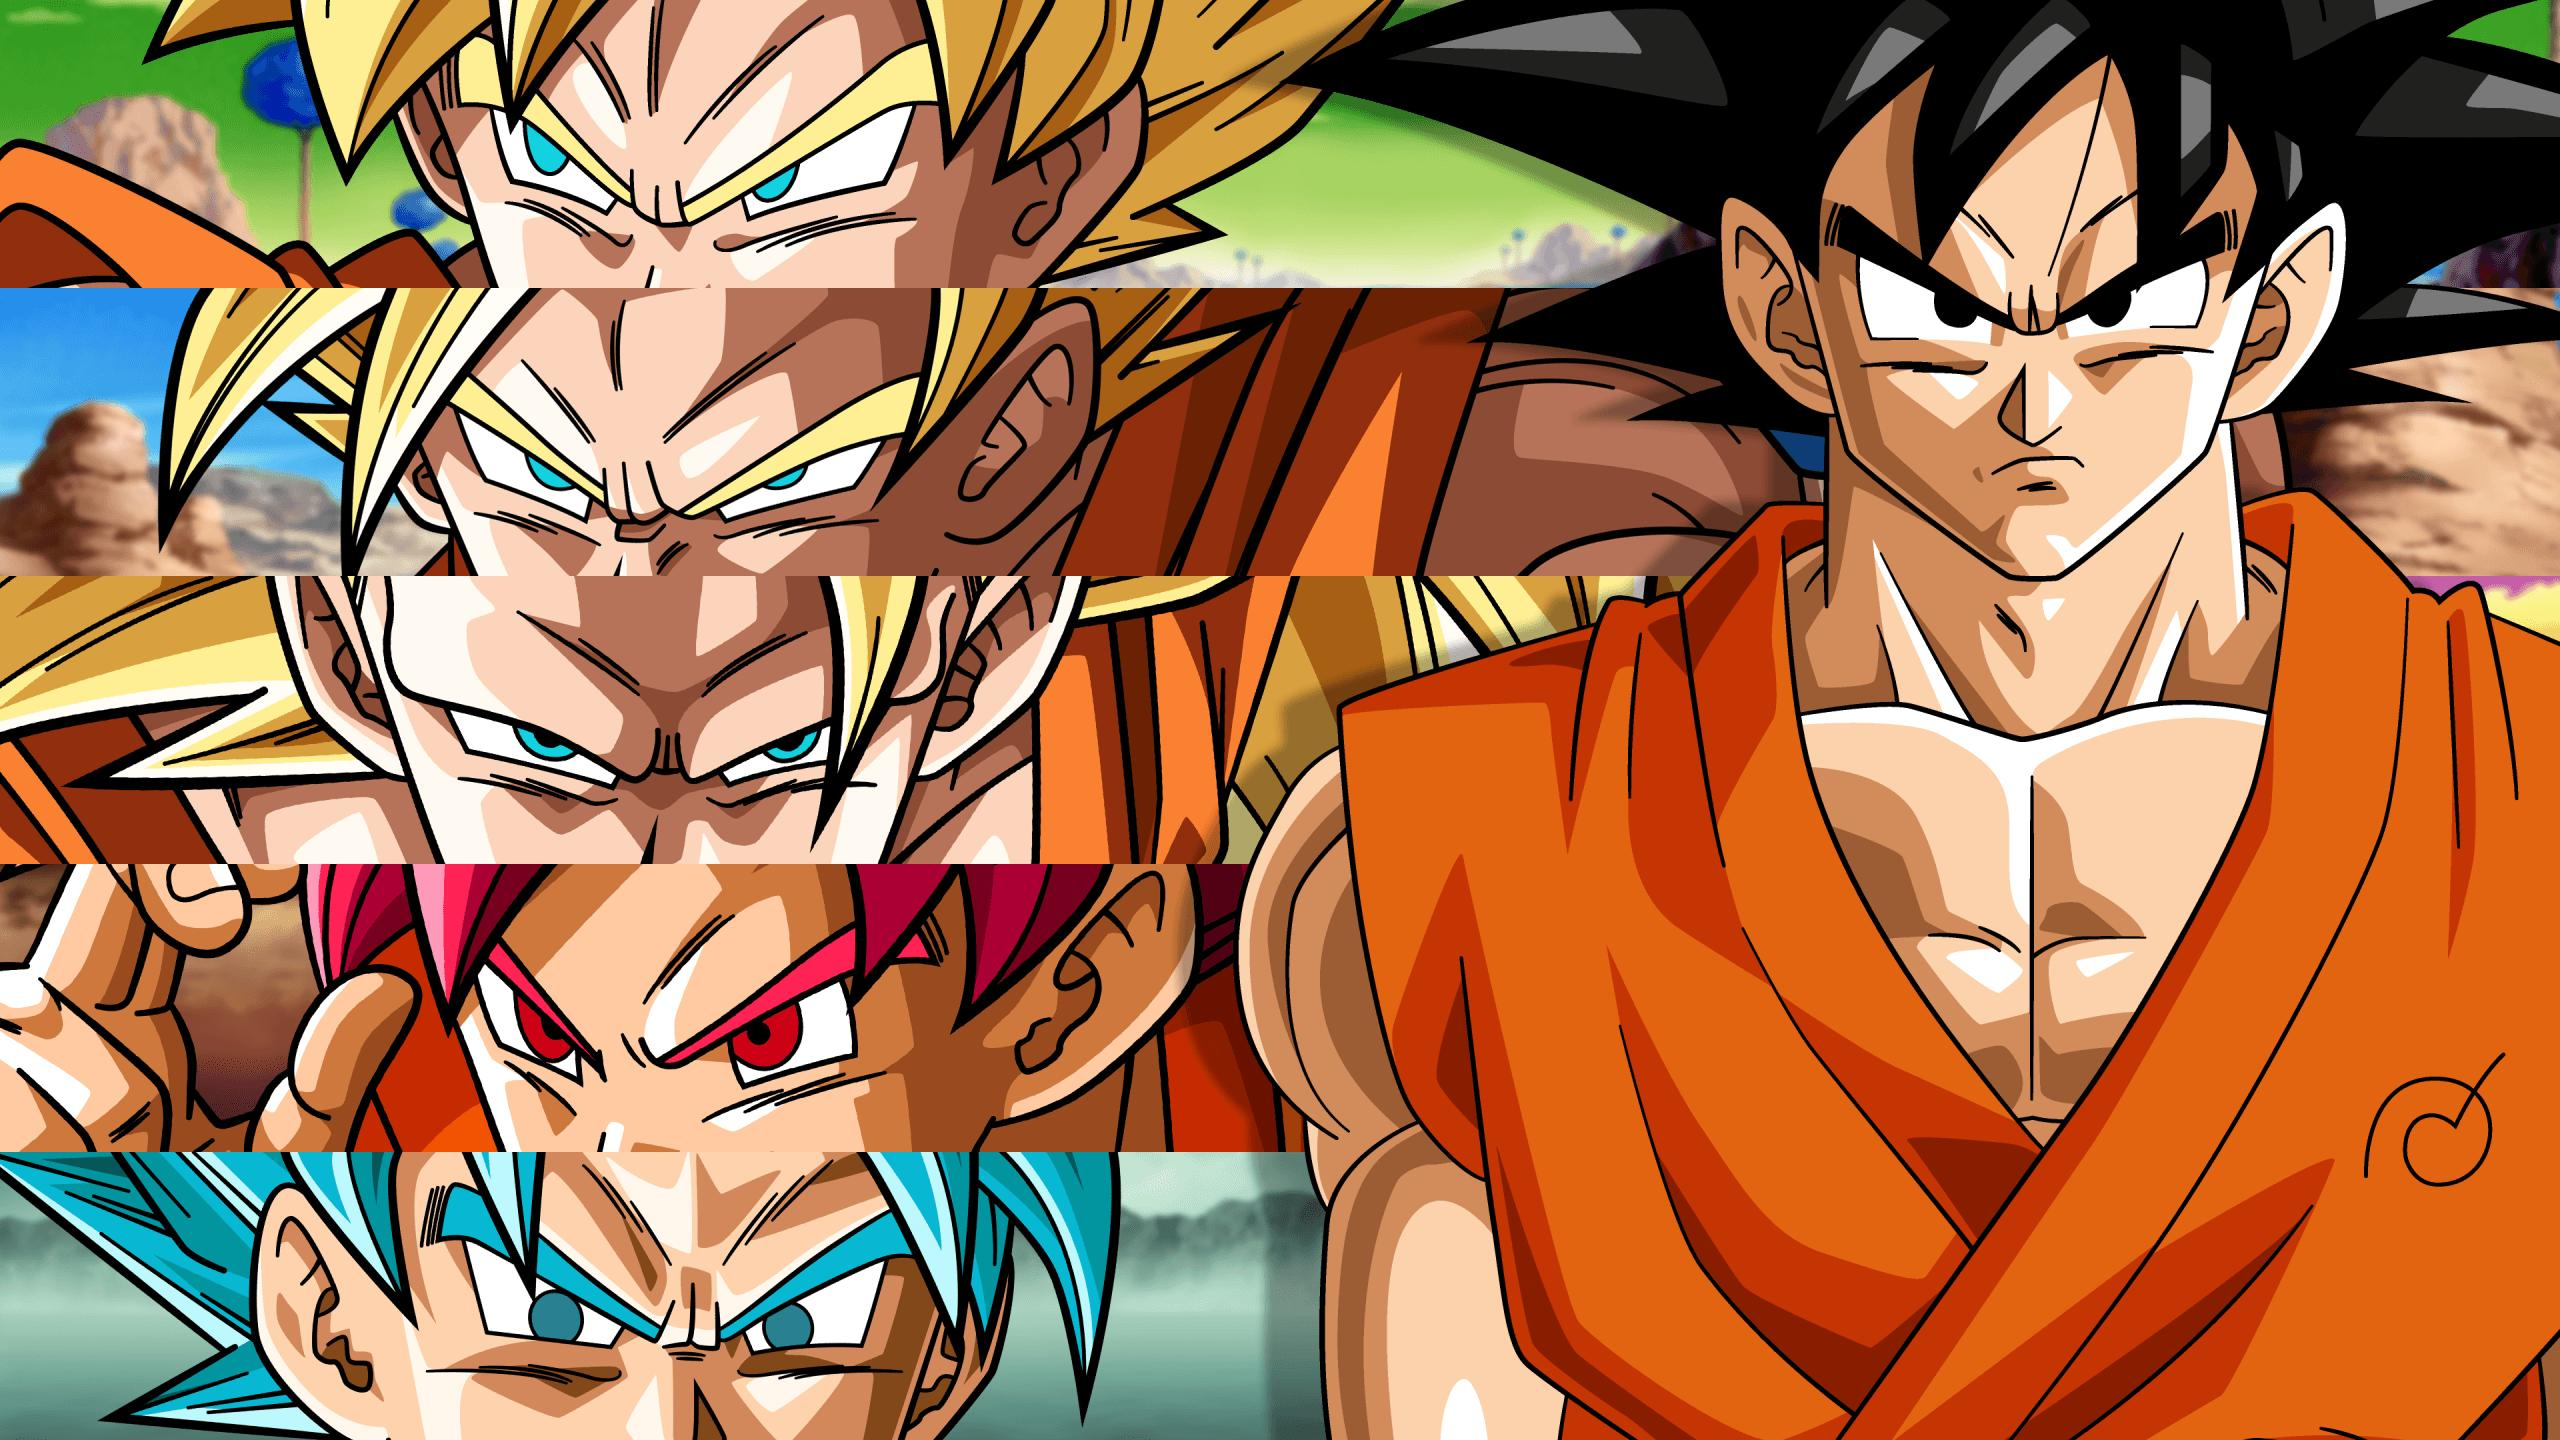 Goku Vegeta 4k Wallpapers Top Free Goku Vegeta 4k Backgrounds Wallpaperaccess